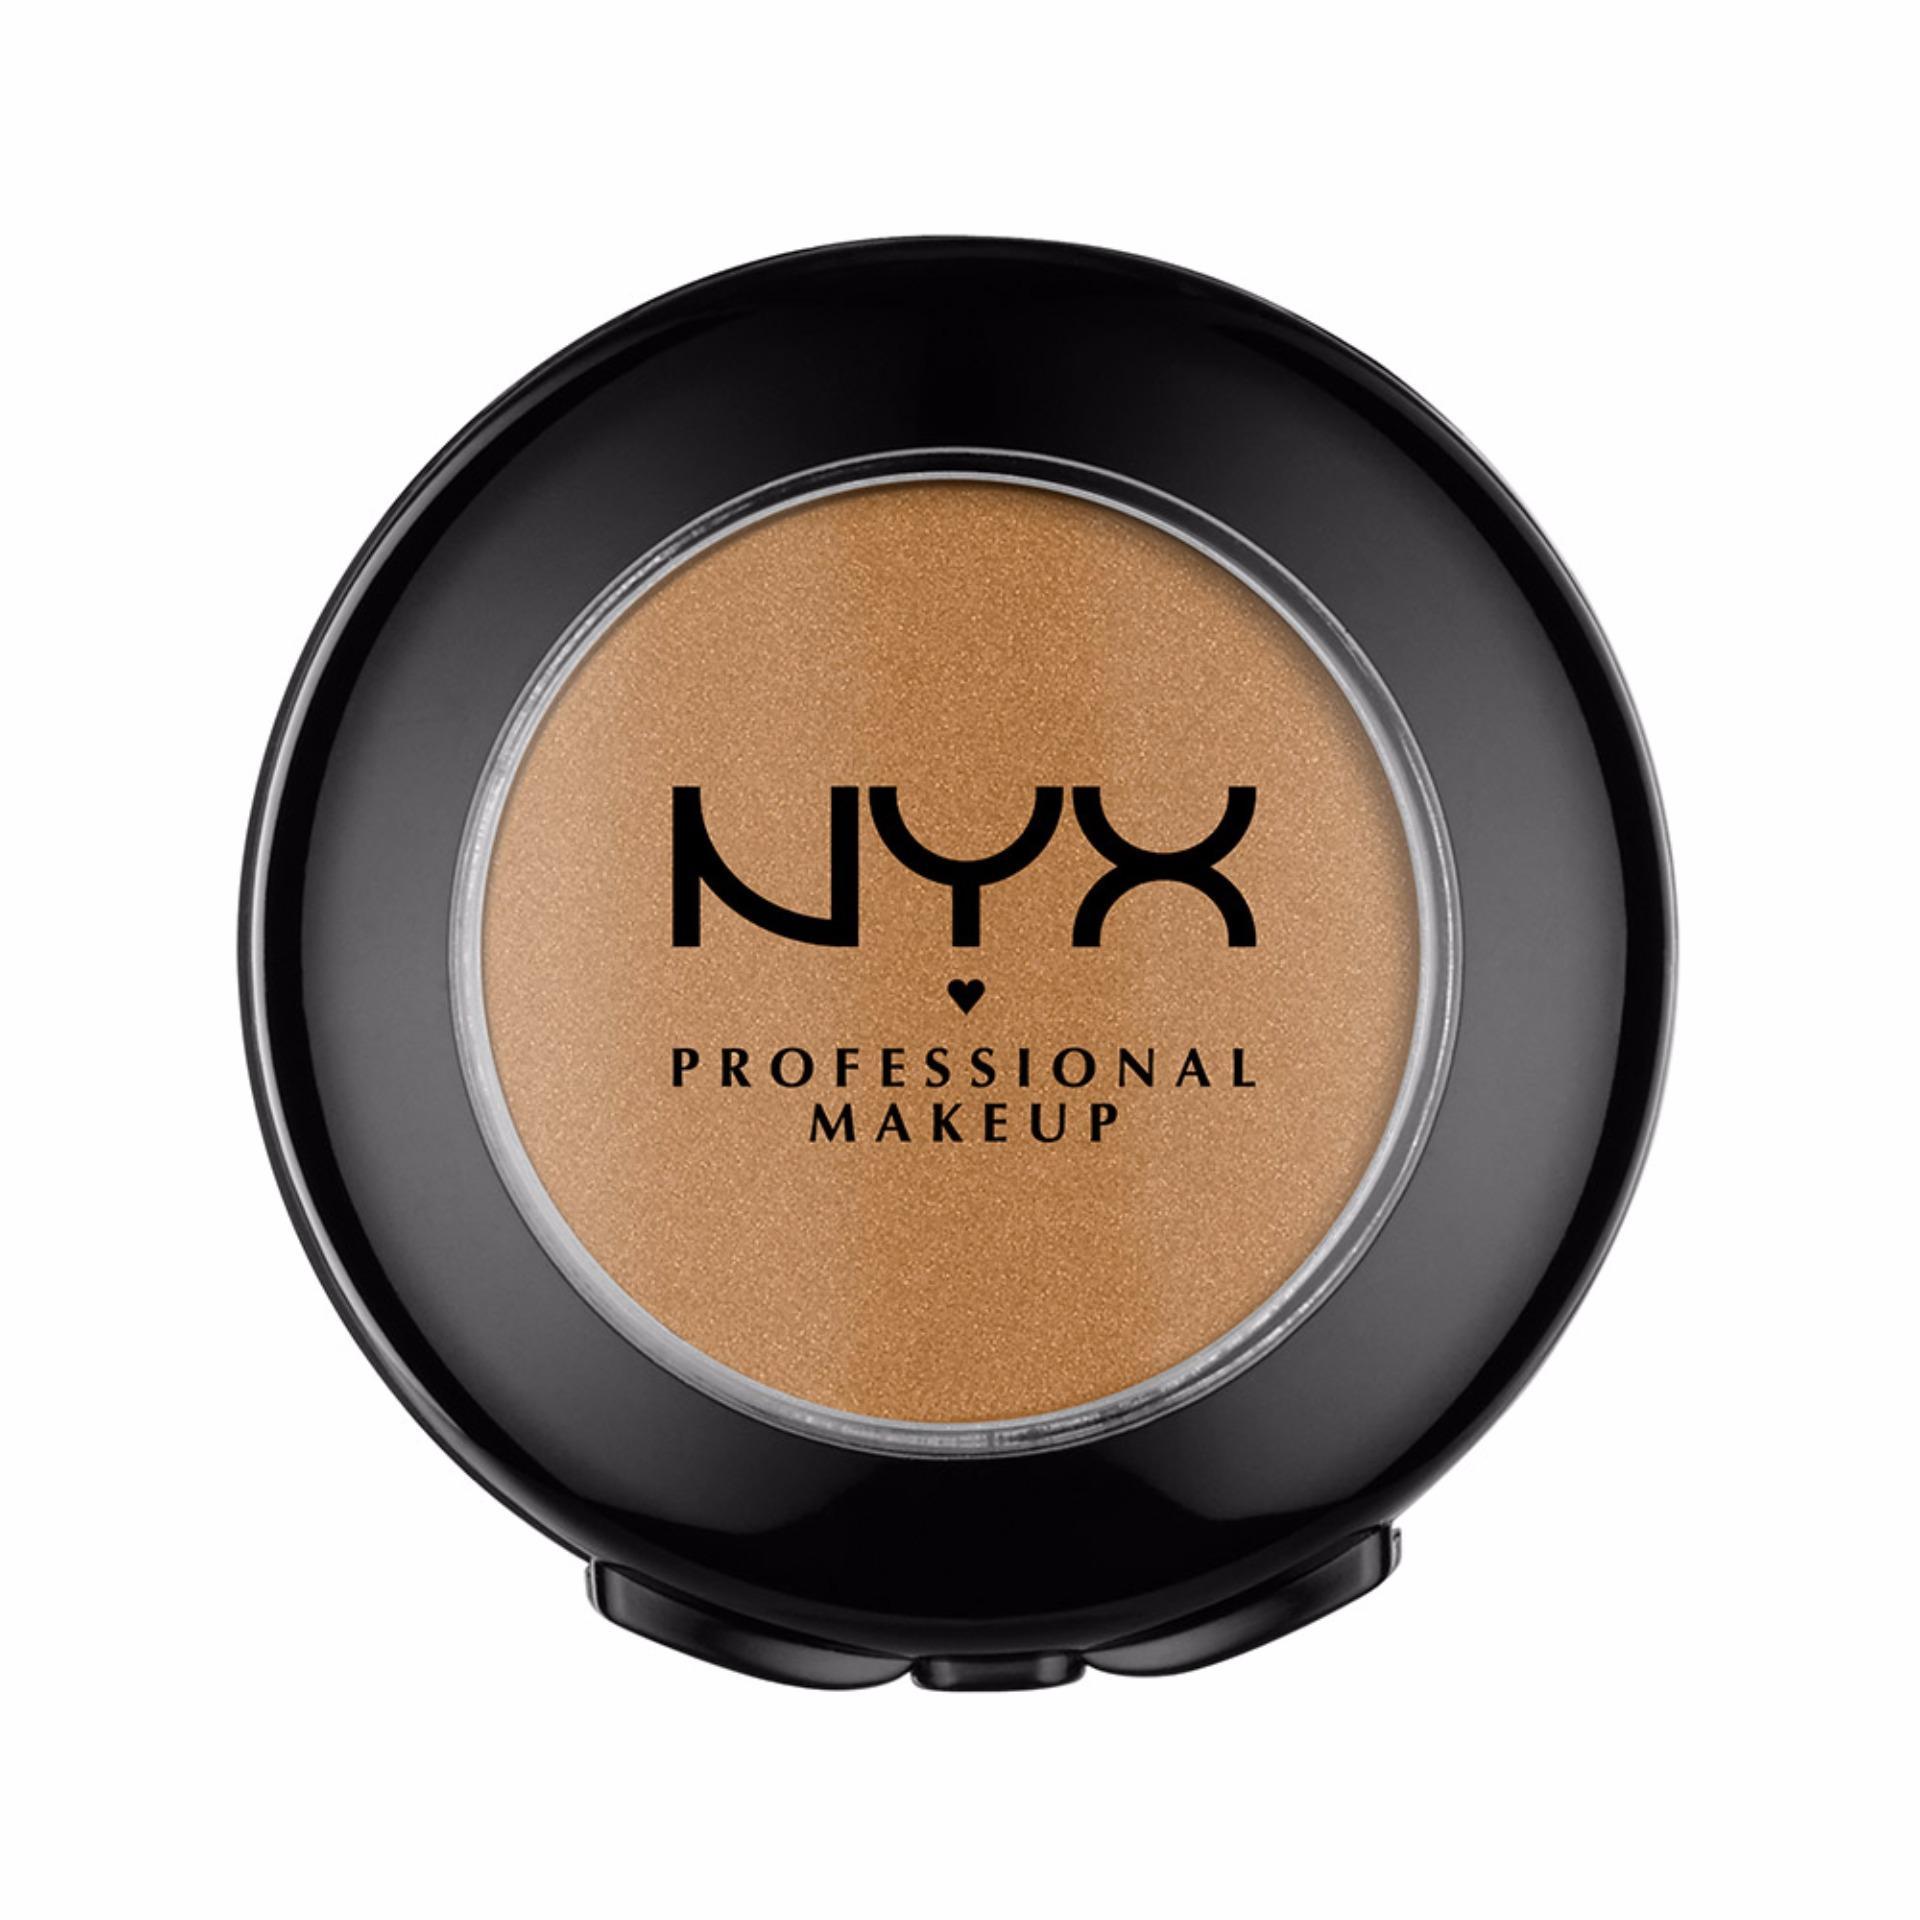 Nyx Professional Make Up Prismatic Shadow Glass Slipper Eyeshadow Kdz Wf58114 Kickstart Shimmer Blackchampagne Makeup Hot Singles Eye Hypnotized